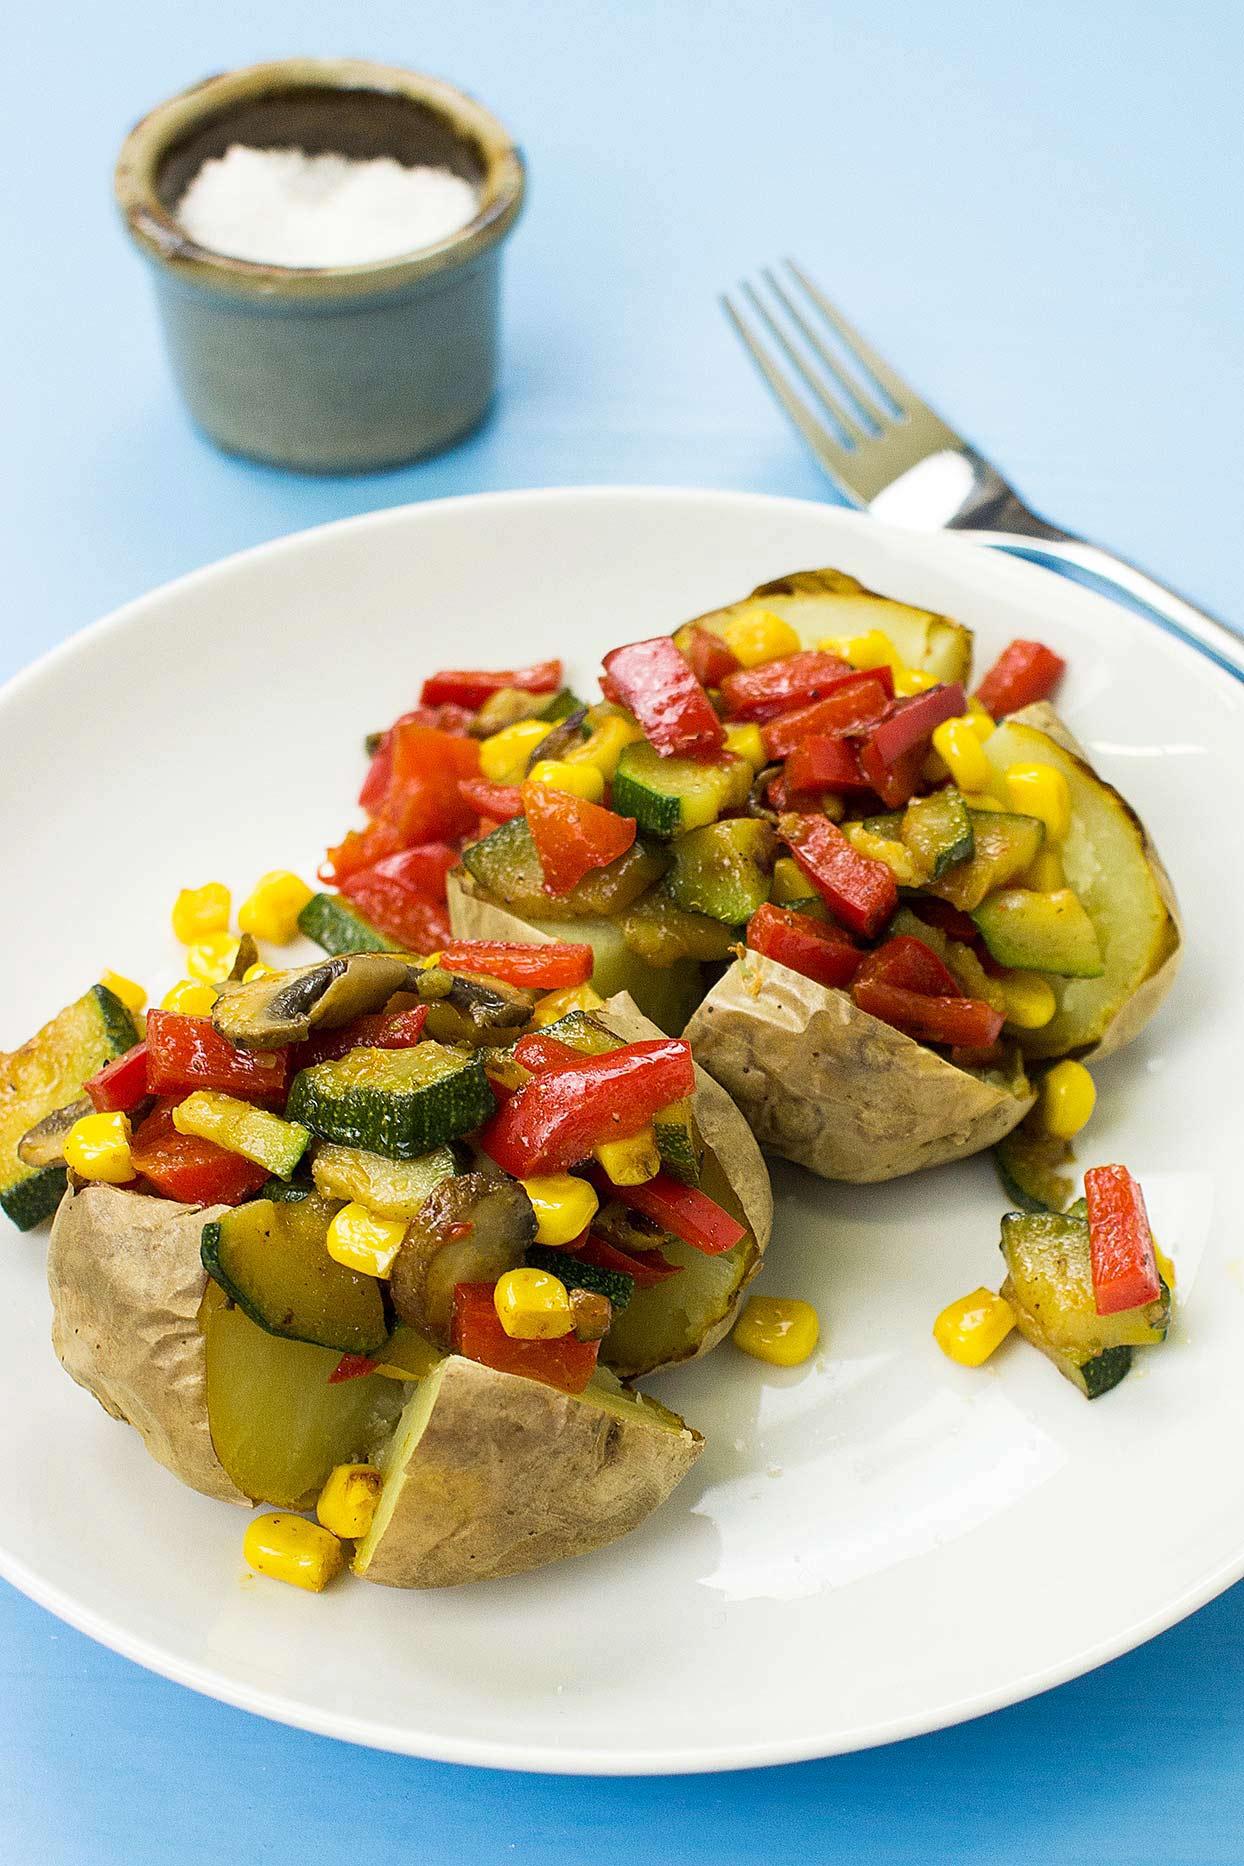 The Veggie King Microwave Baked Potato Recipe  hurrythefoodup.com